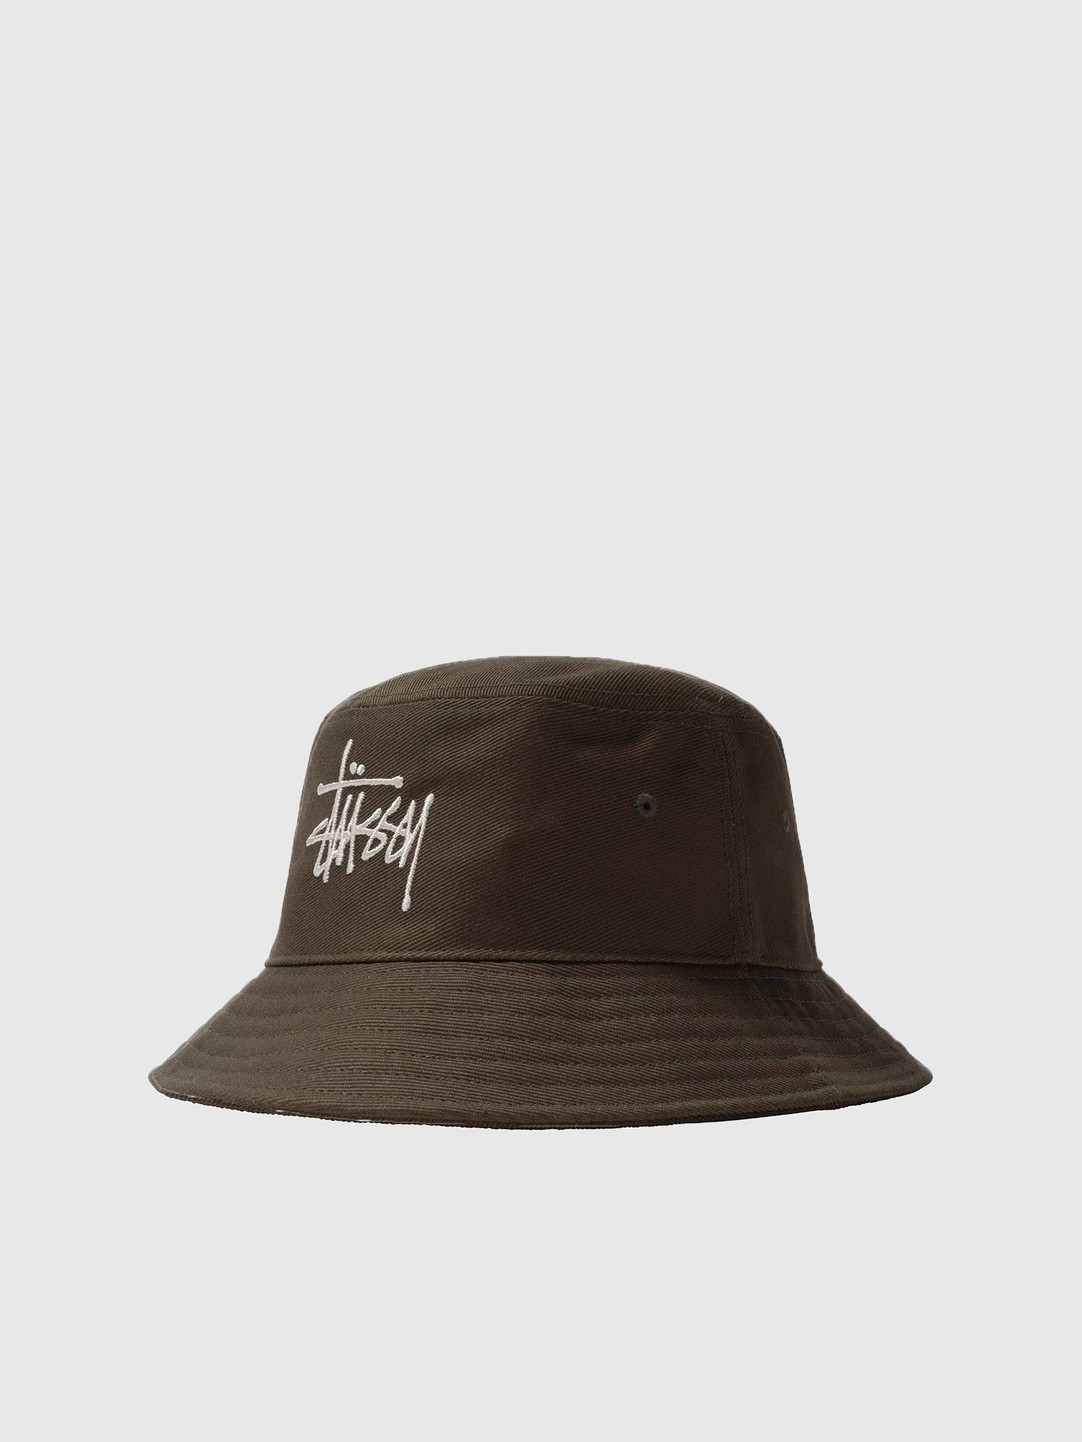 Stussy Stussy Big Logo Twill Bucket Hat Olive 1321024-0403